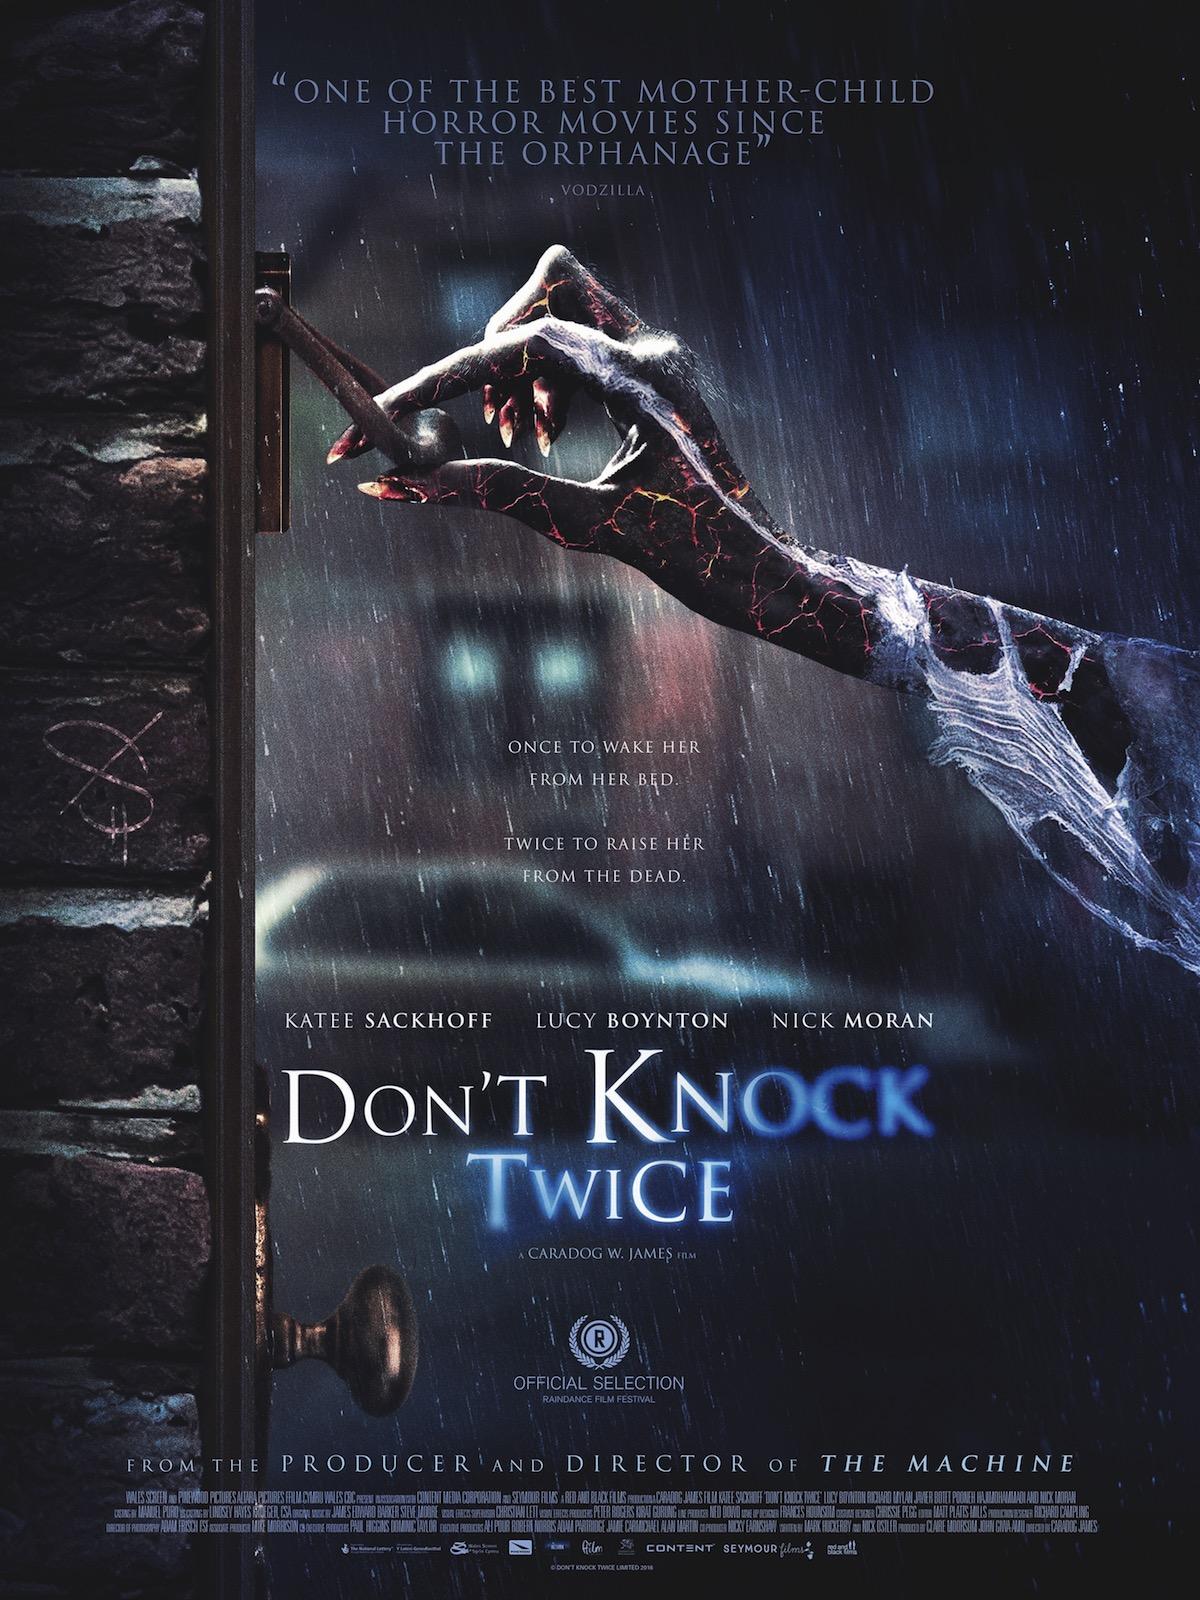 DontKnockTwice_Poster1.jpg